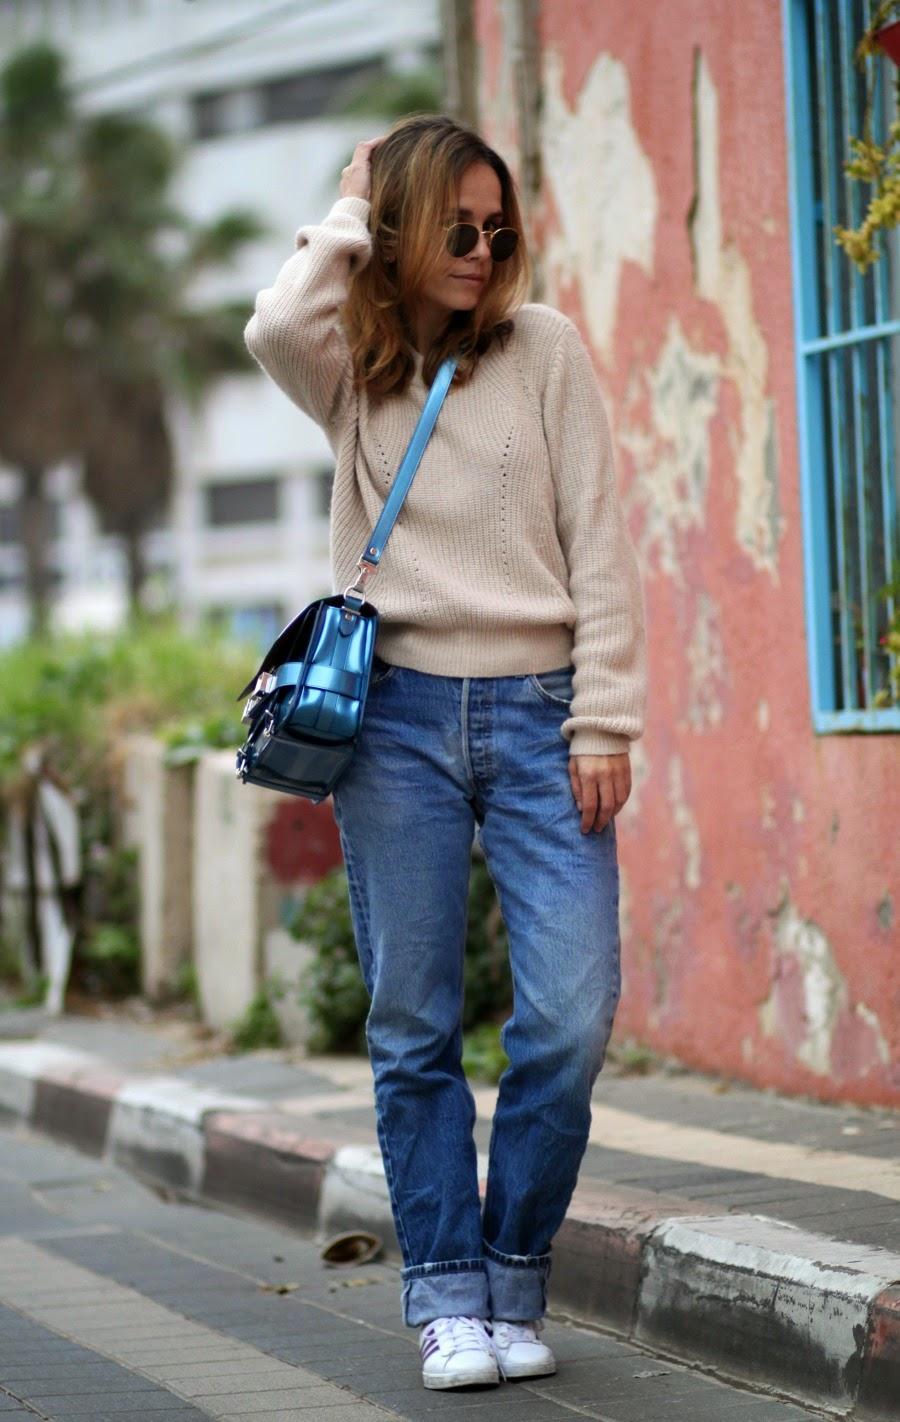 vintage, levi's501, lookoftheday, ootd, streetstyle, fashiontelaviv, fashionblog, אופנה,ליוויס501, בלוגאופנה, סטייל